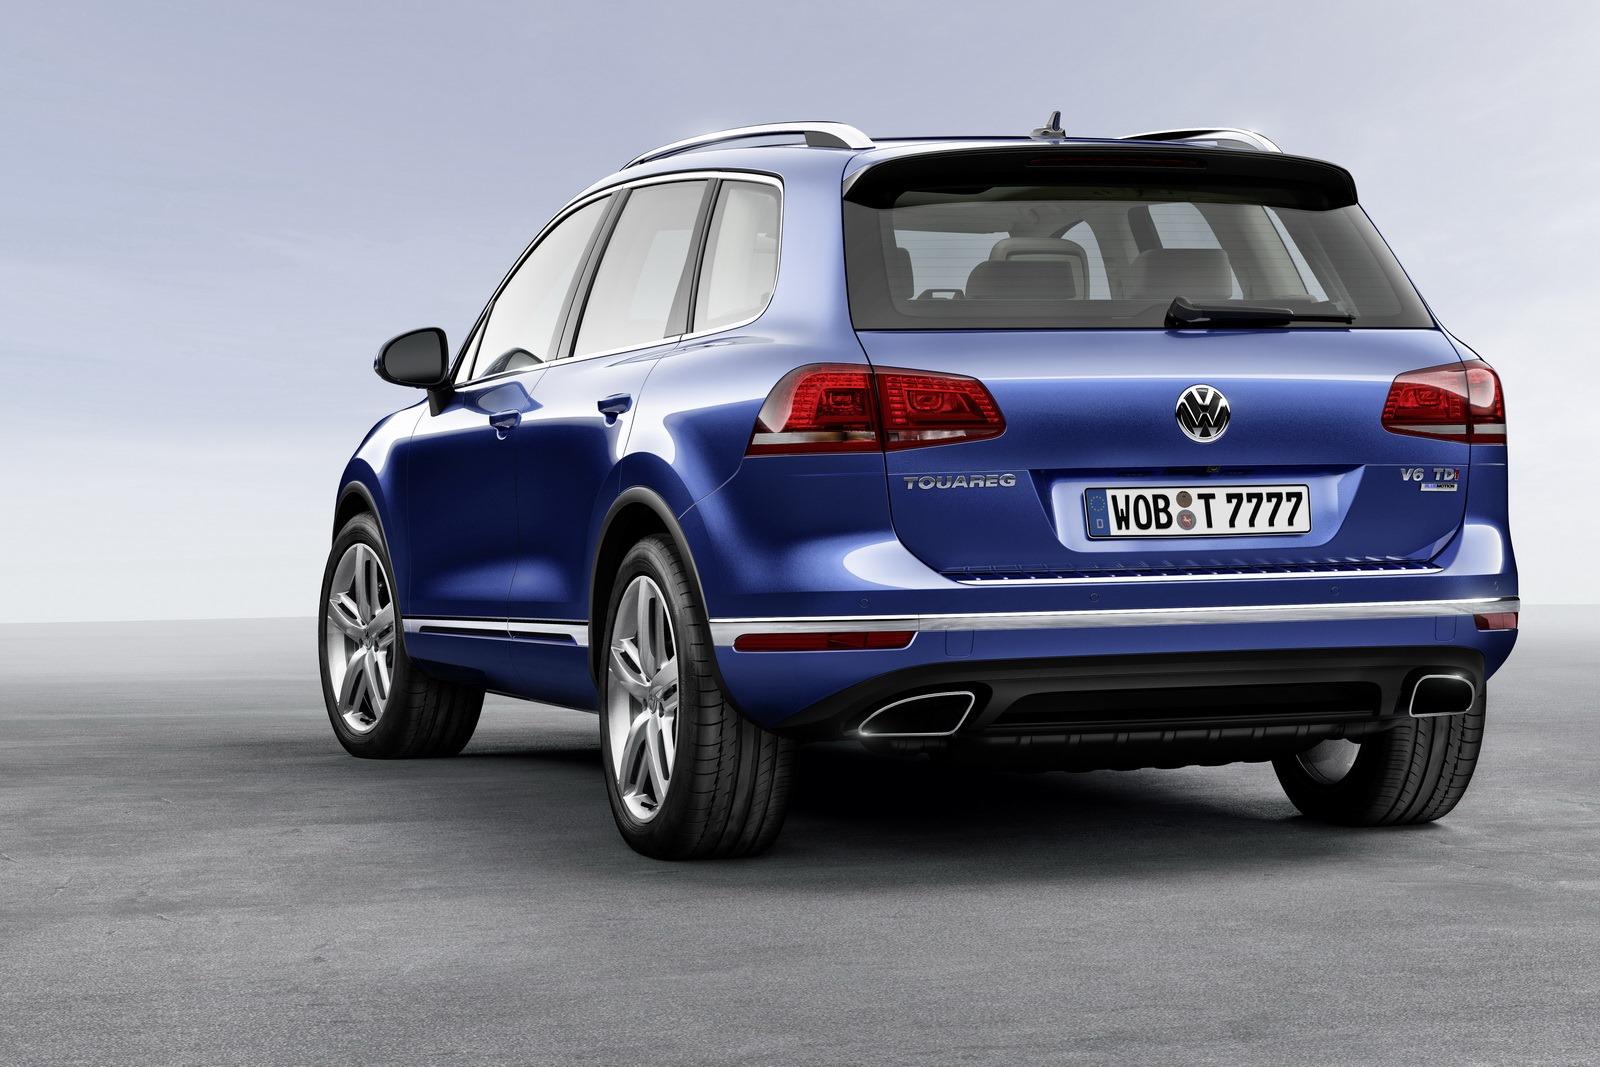 2015 Volkswagen Touareg Facelift Brings New Features - autoevolution